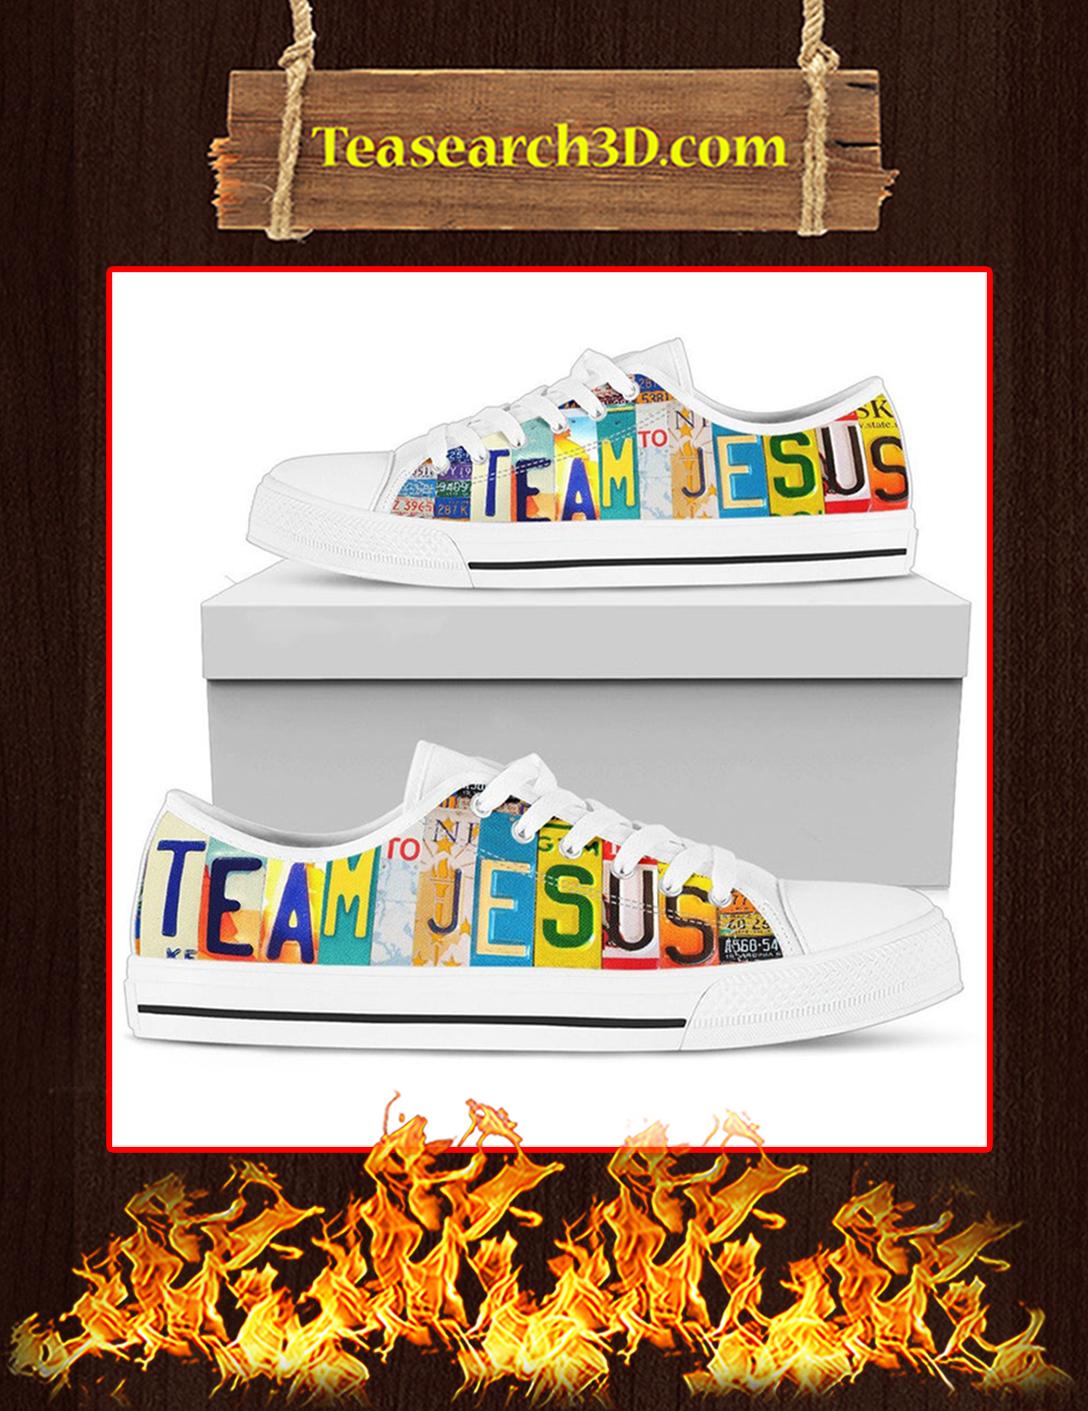 Team Jesus Low Top Shoes - Pic 2